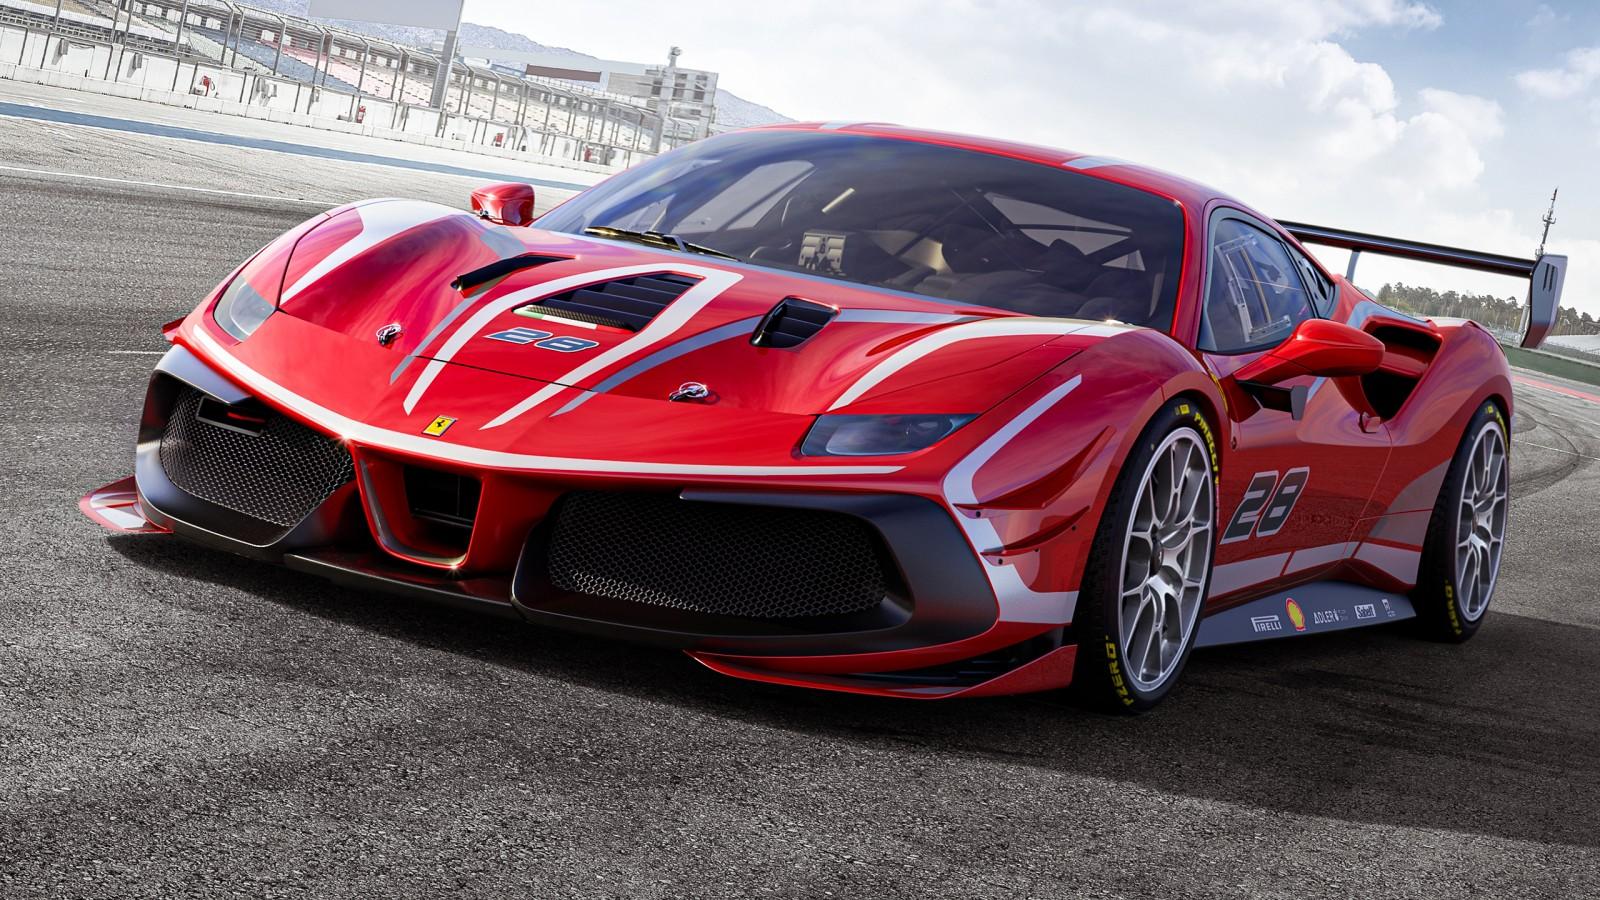 36] Ferrari 488 Challenge Evo 2020 Wallpapers on WallpaperSafari 1600x900